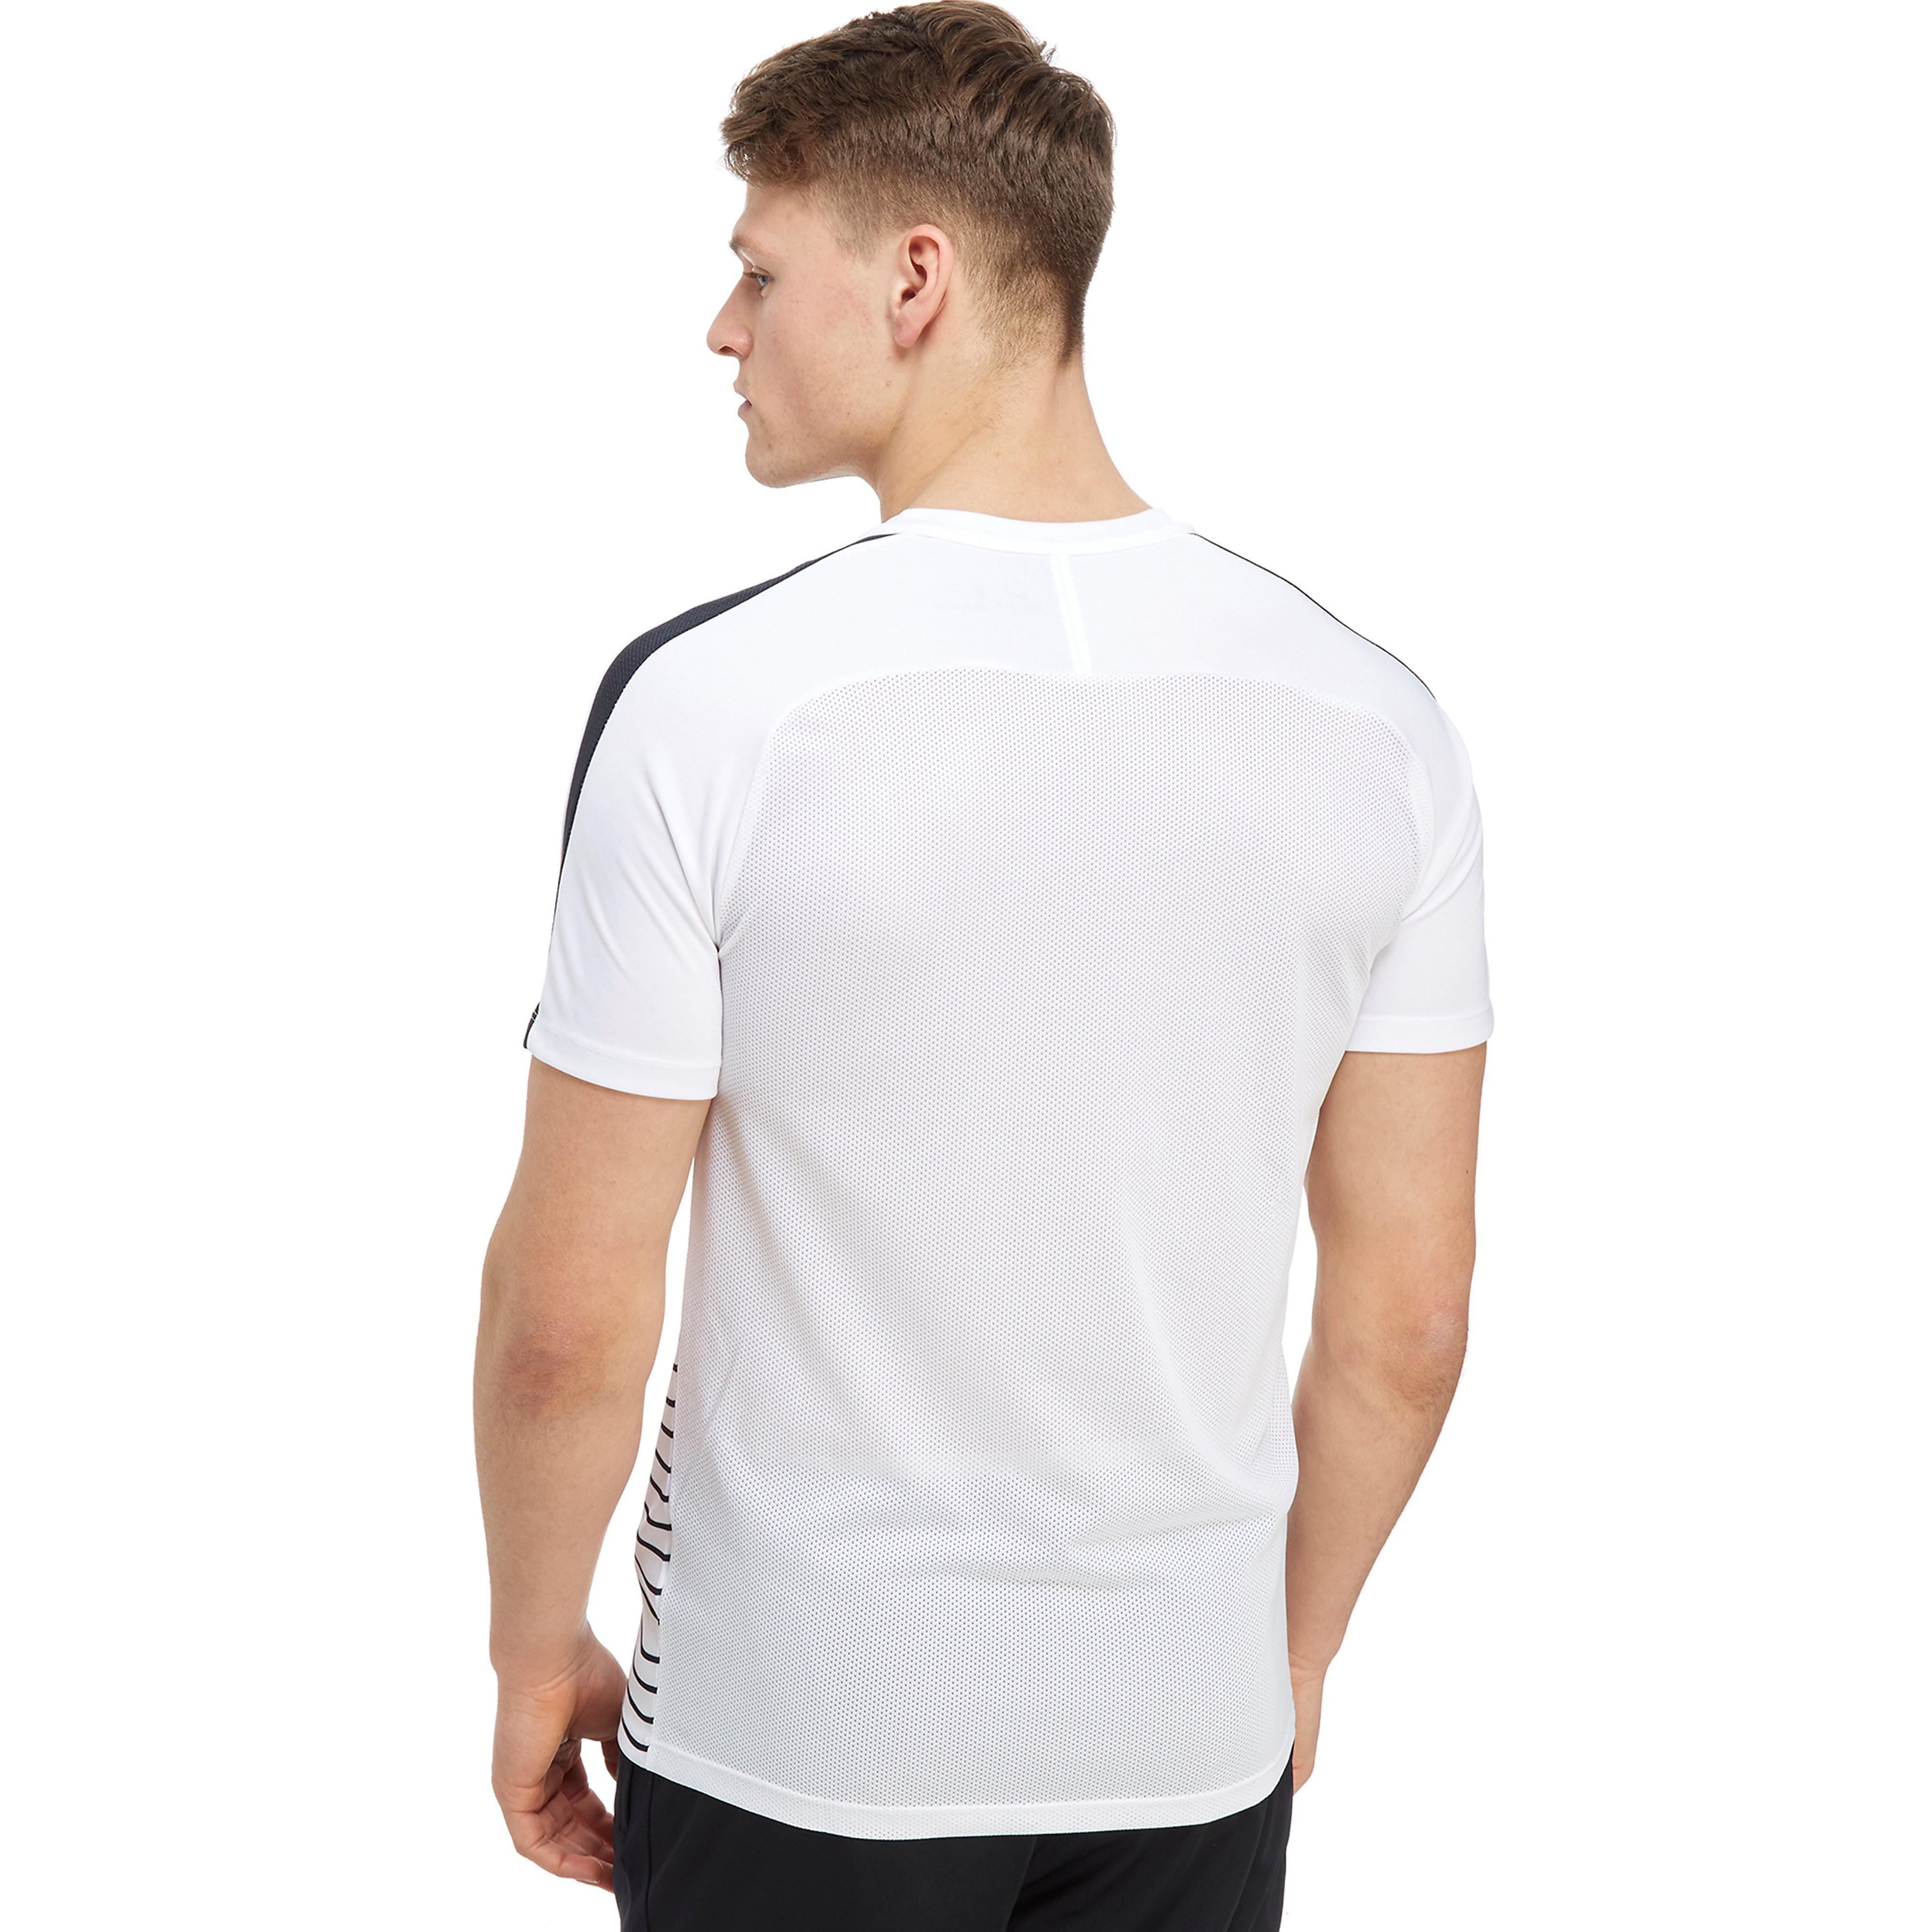 Nike Academy GPX Men's Training T-Shirt